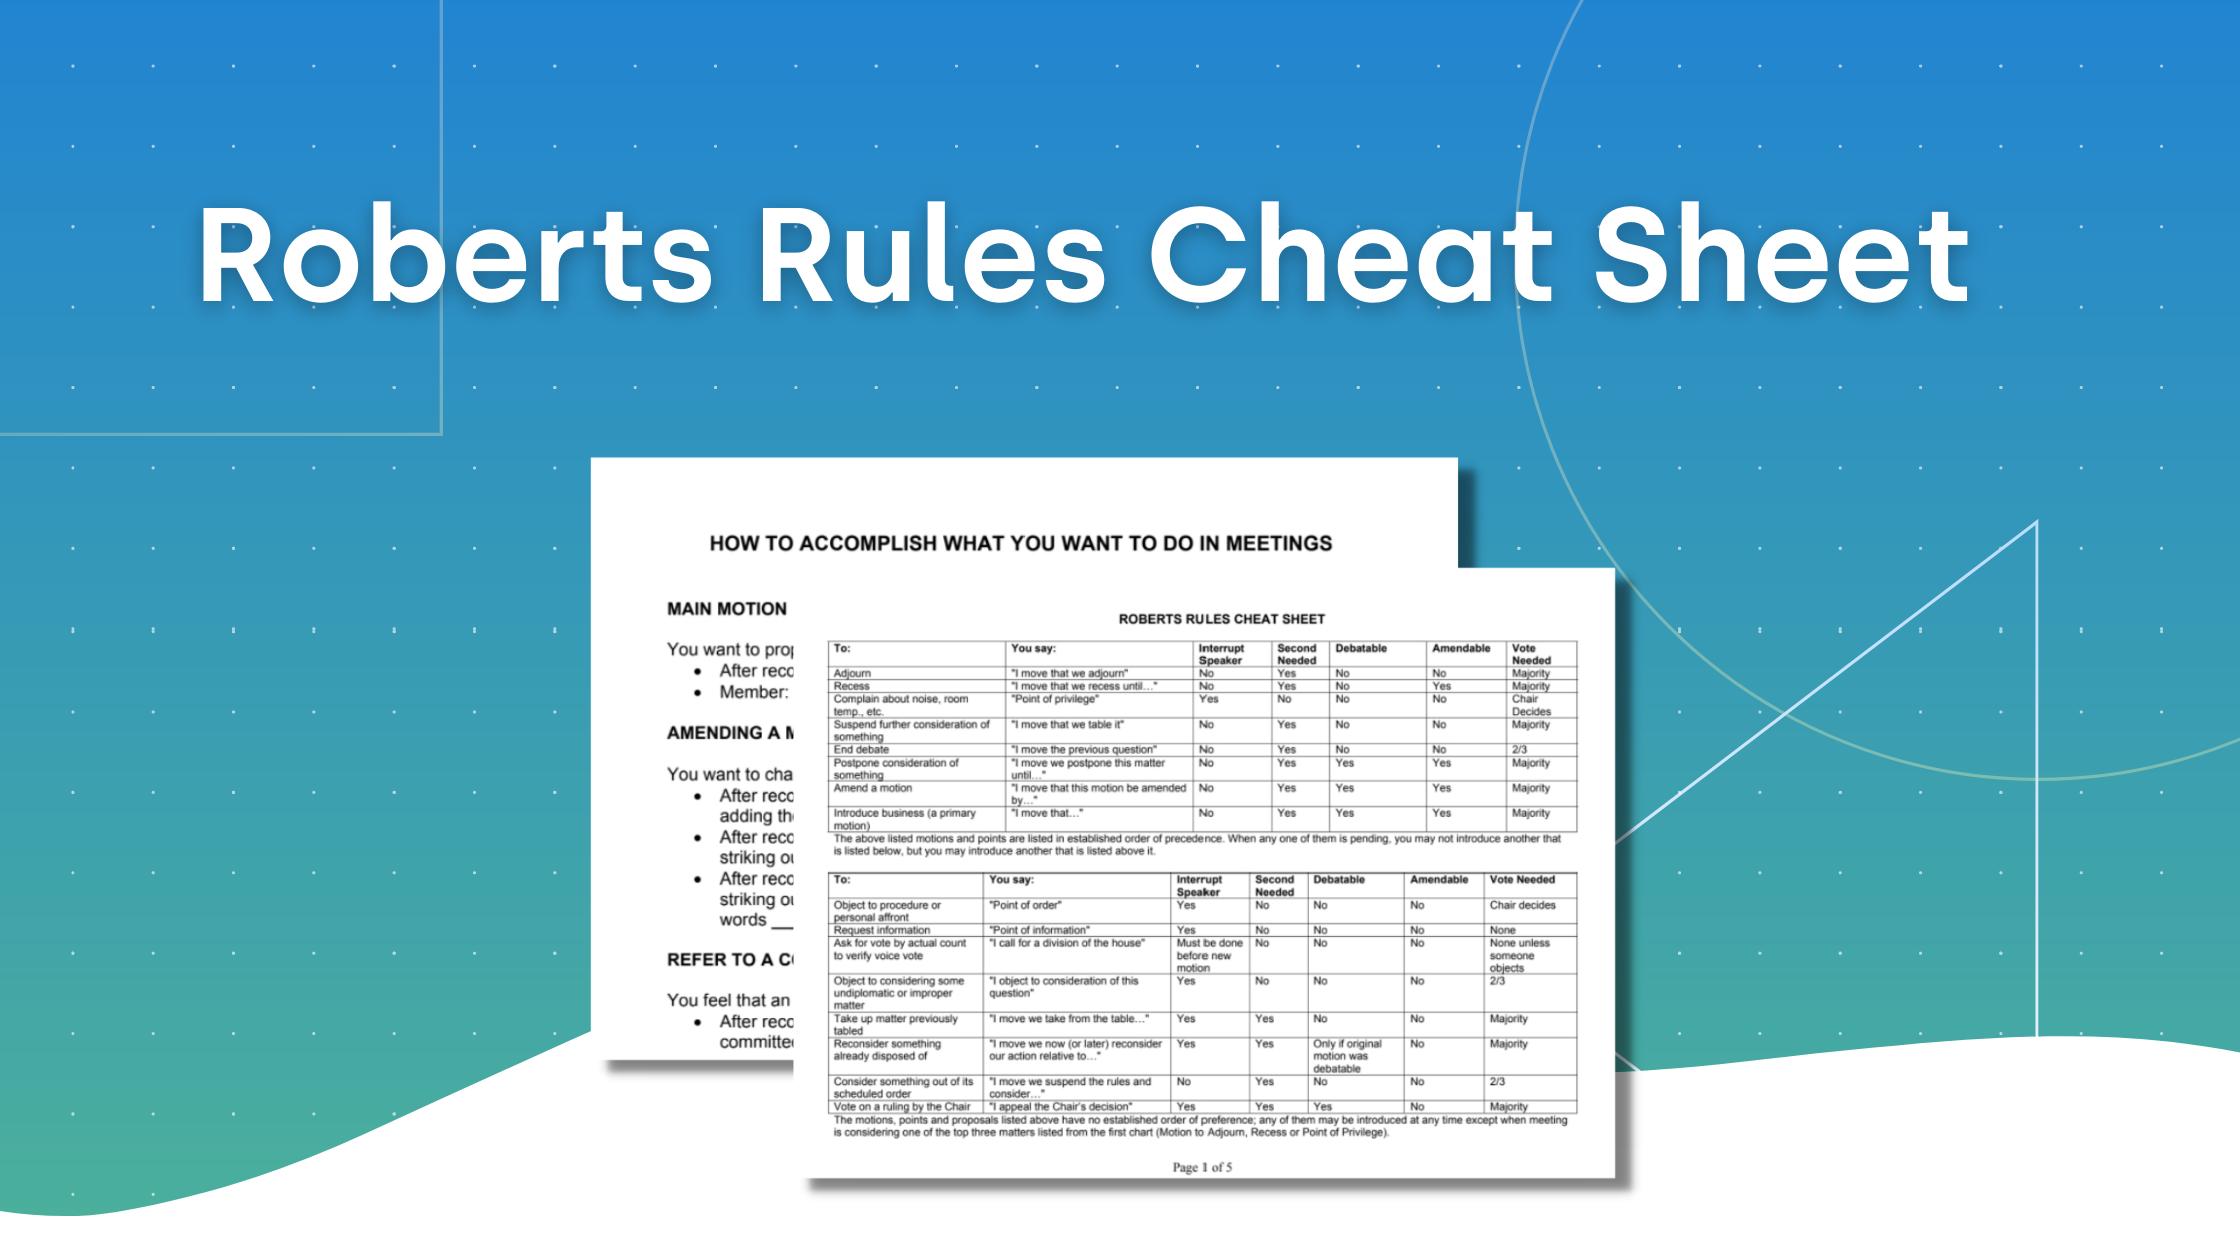 Roberts Rules - Cheat Sheet